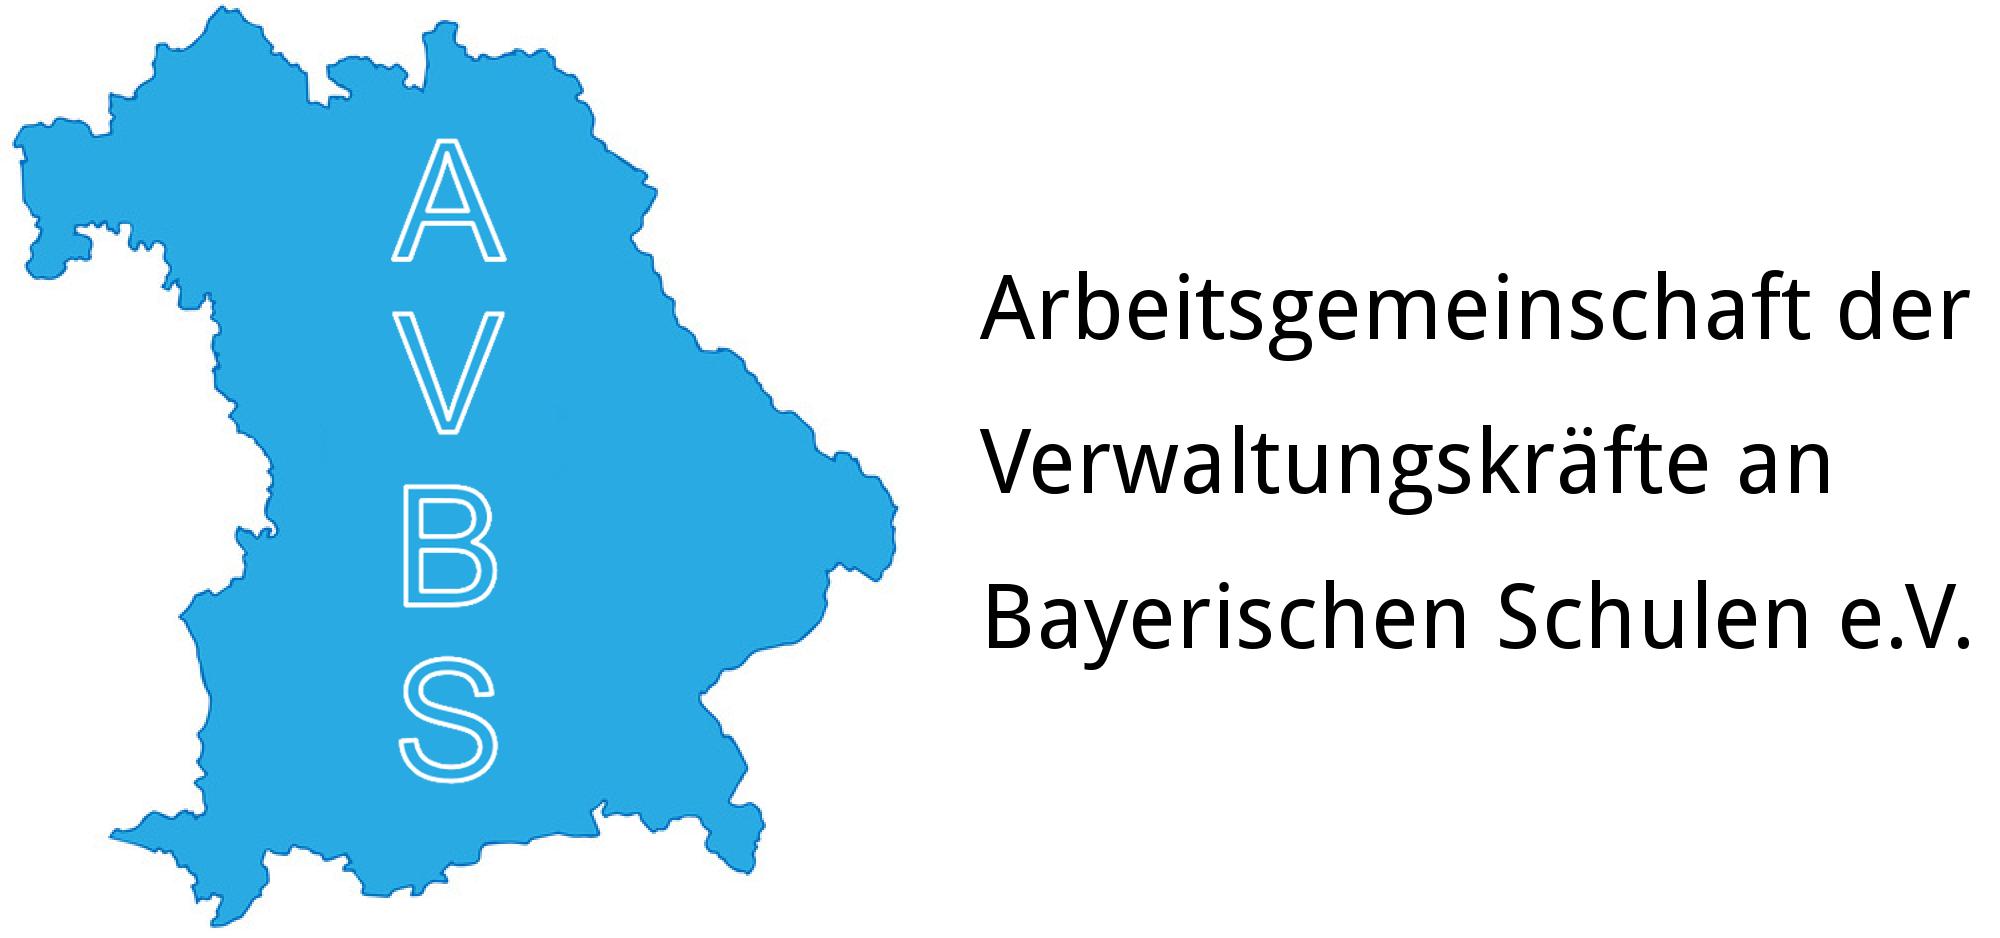 Arbeitsgemeinschaft der Verwaltungskräfte an Bayerischen Schulen e. V. (AVBS)